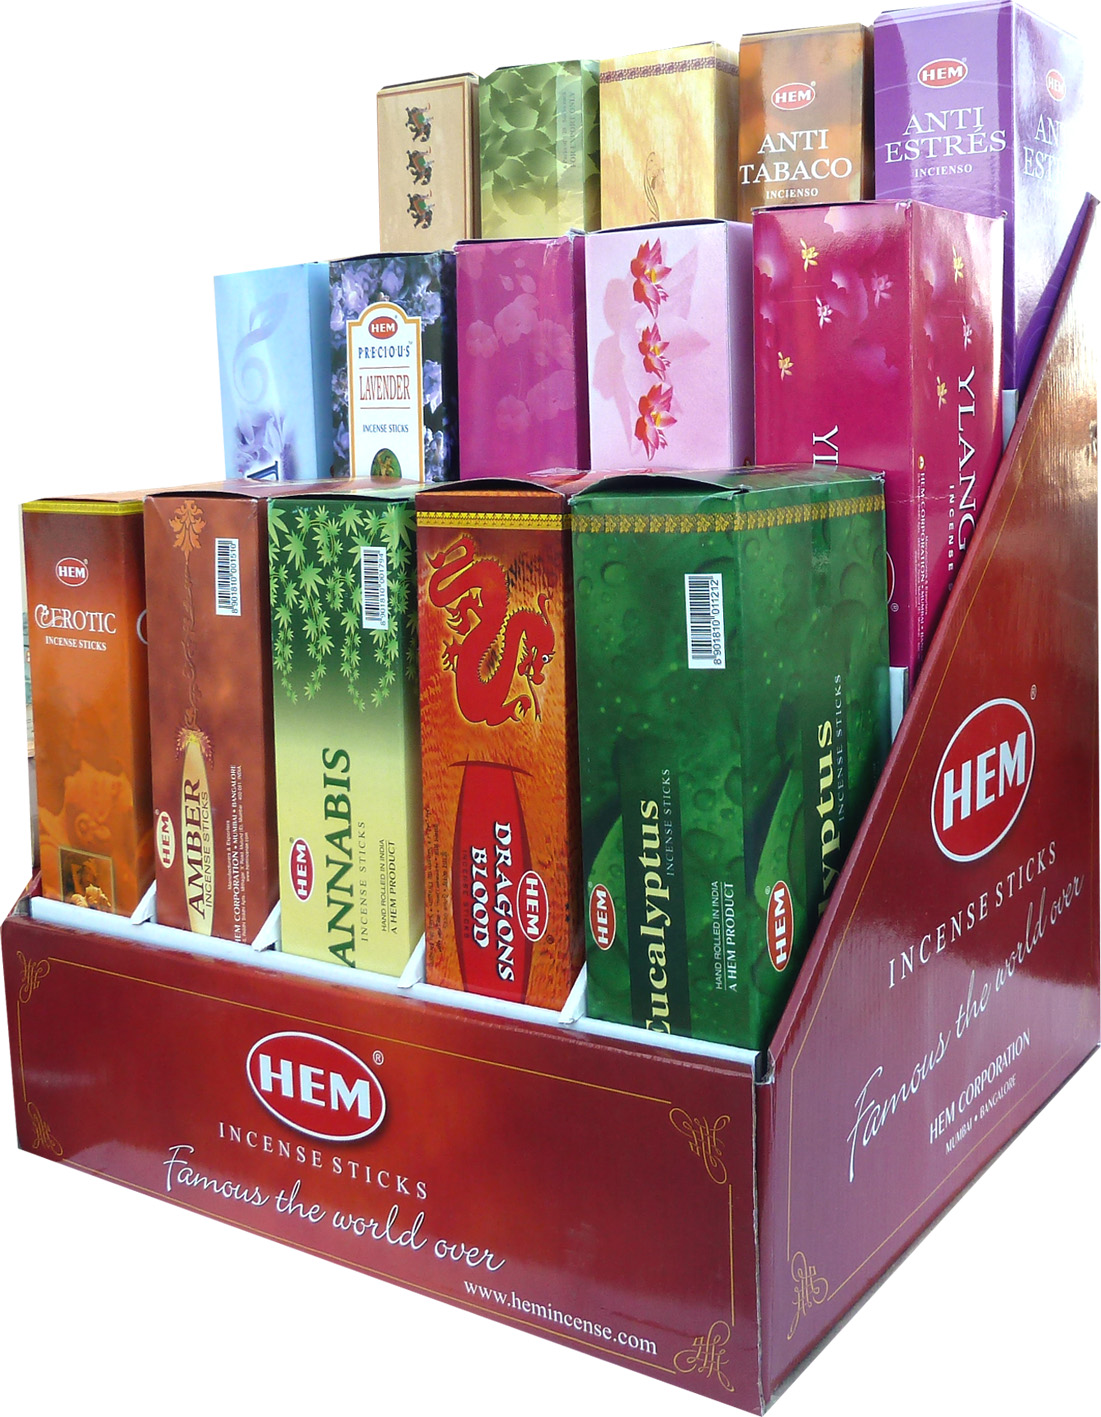 Presentoir encens hem hexa 15 parfums